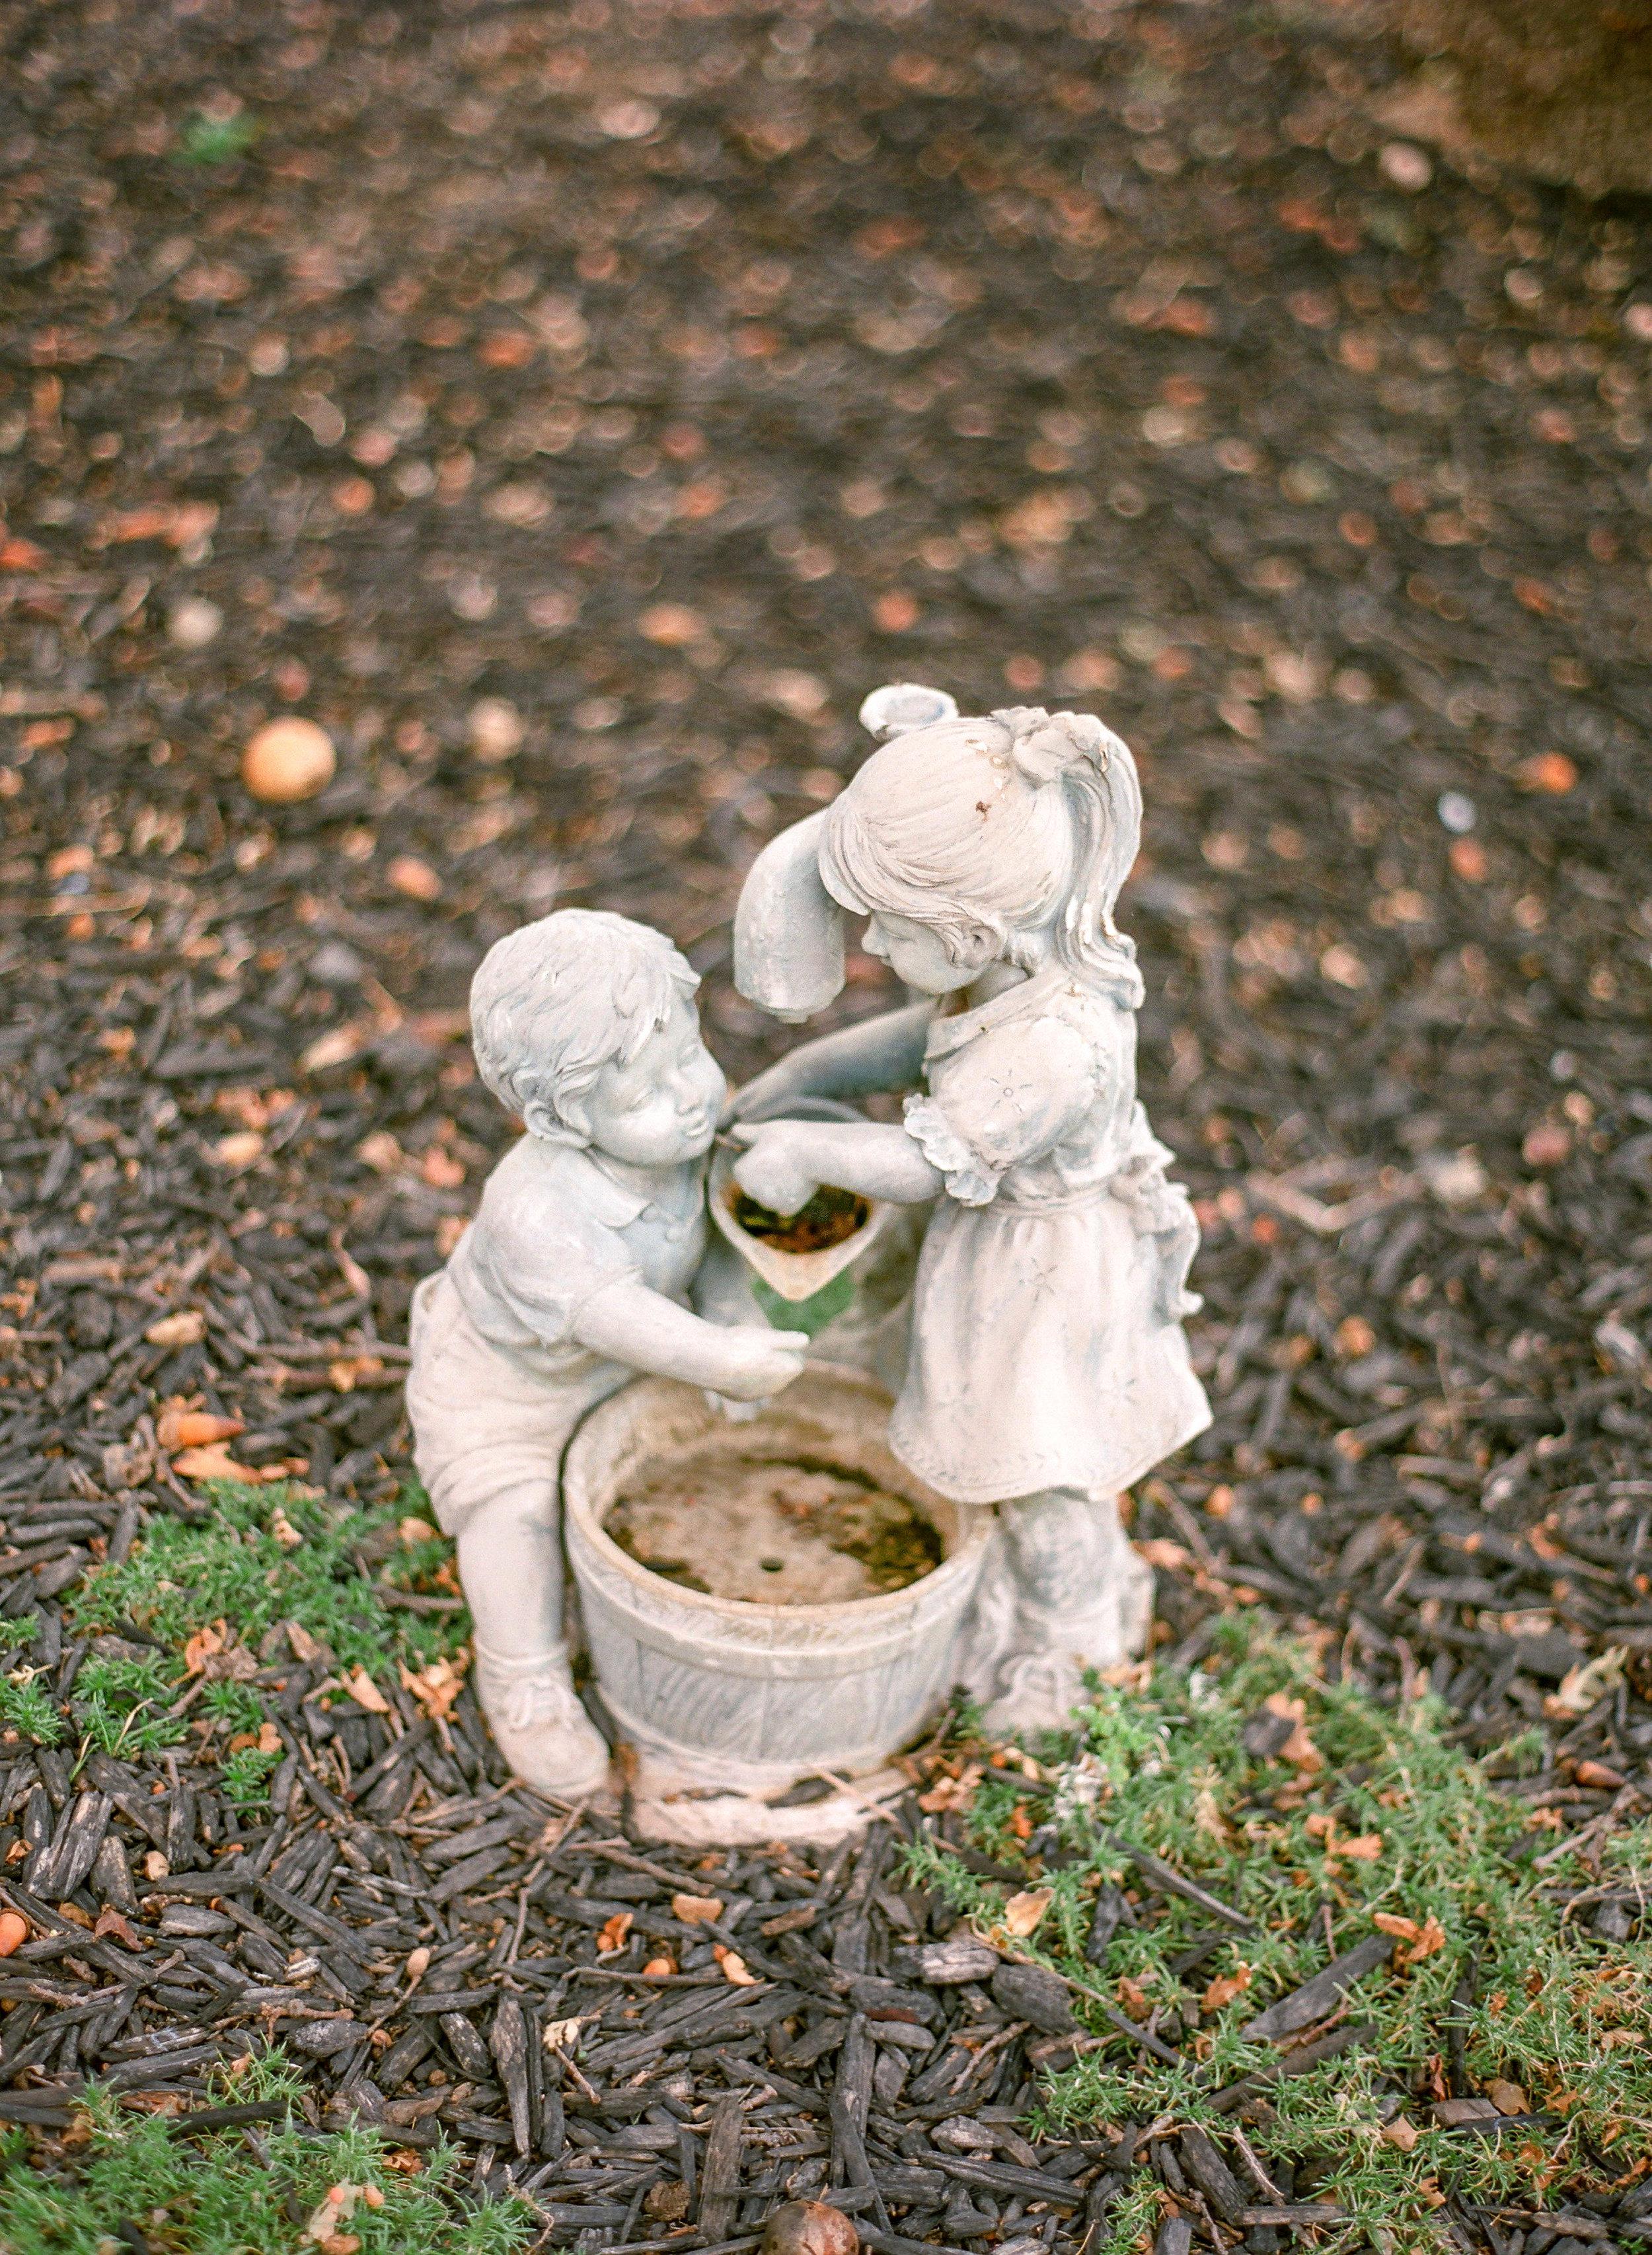 Amador_County_Wedding_Rancho_Victoria_Vineyard_Garden_Sculpture_Northern_California.jpg